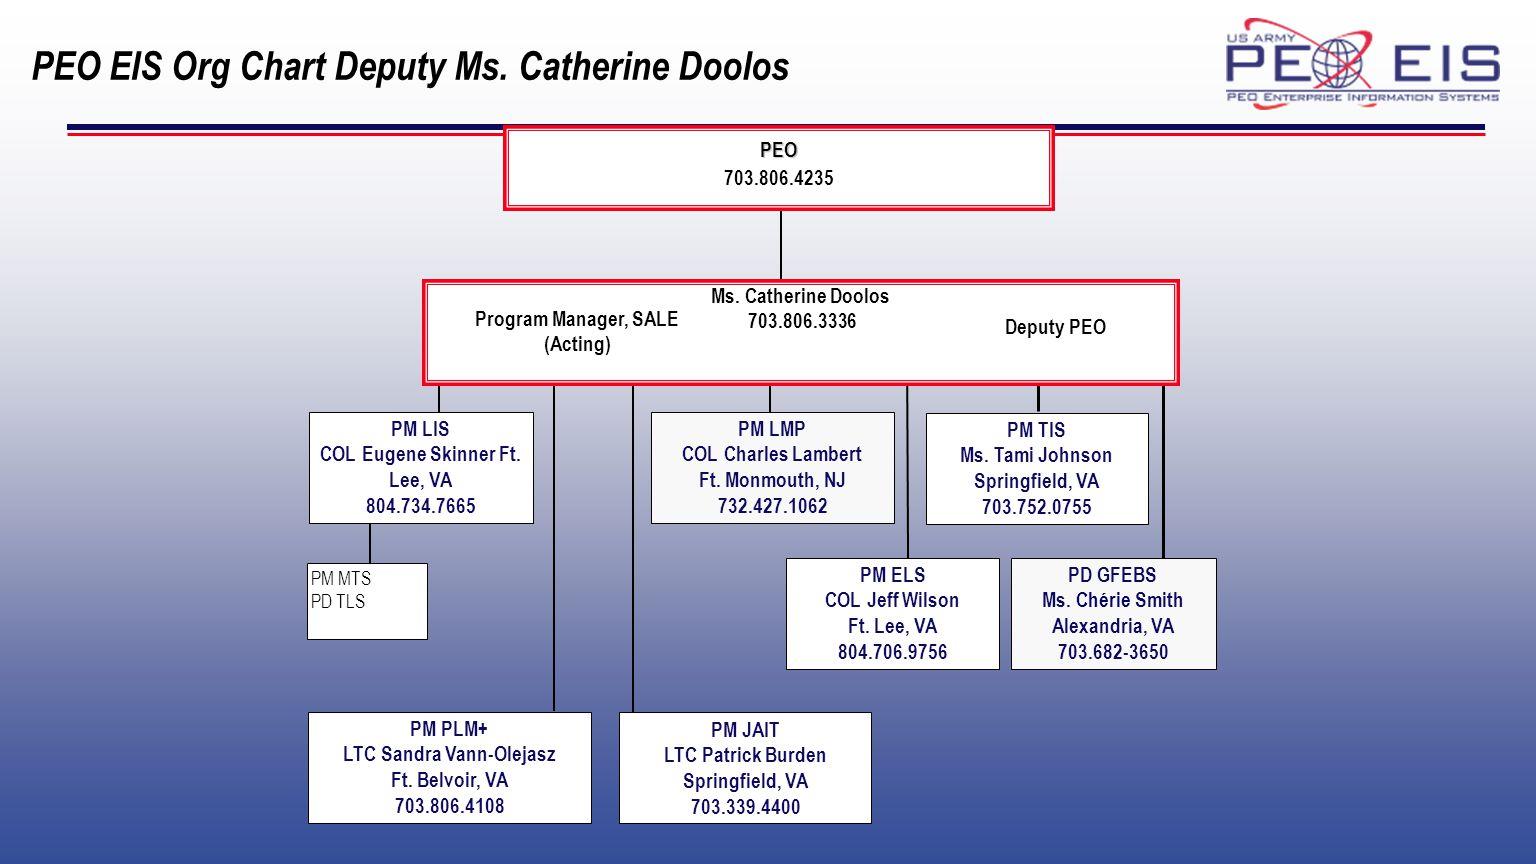 PEO EIS Org Chart Deputy Ms. Catherine Doolos